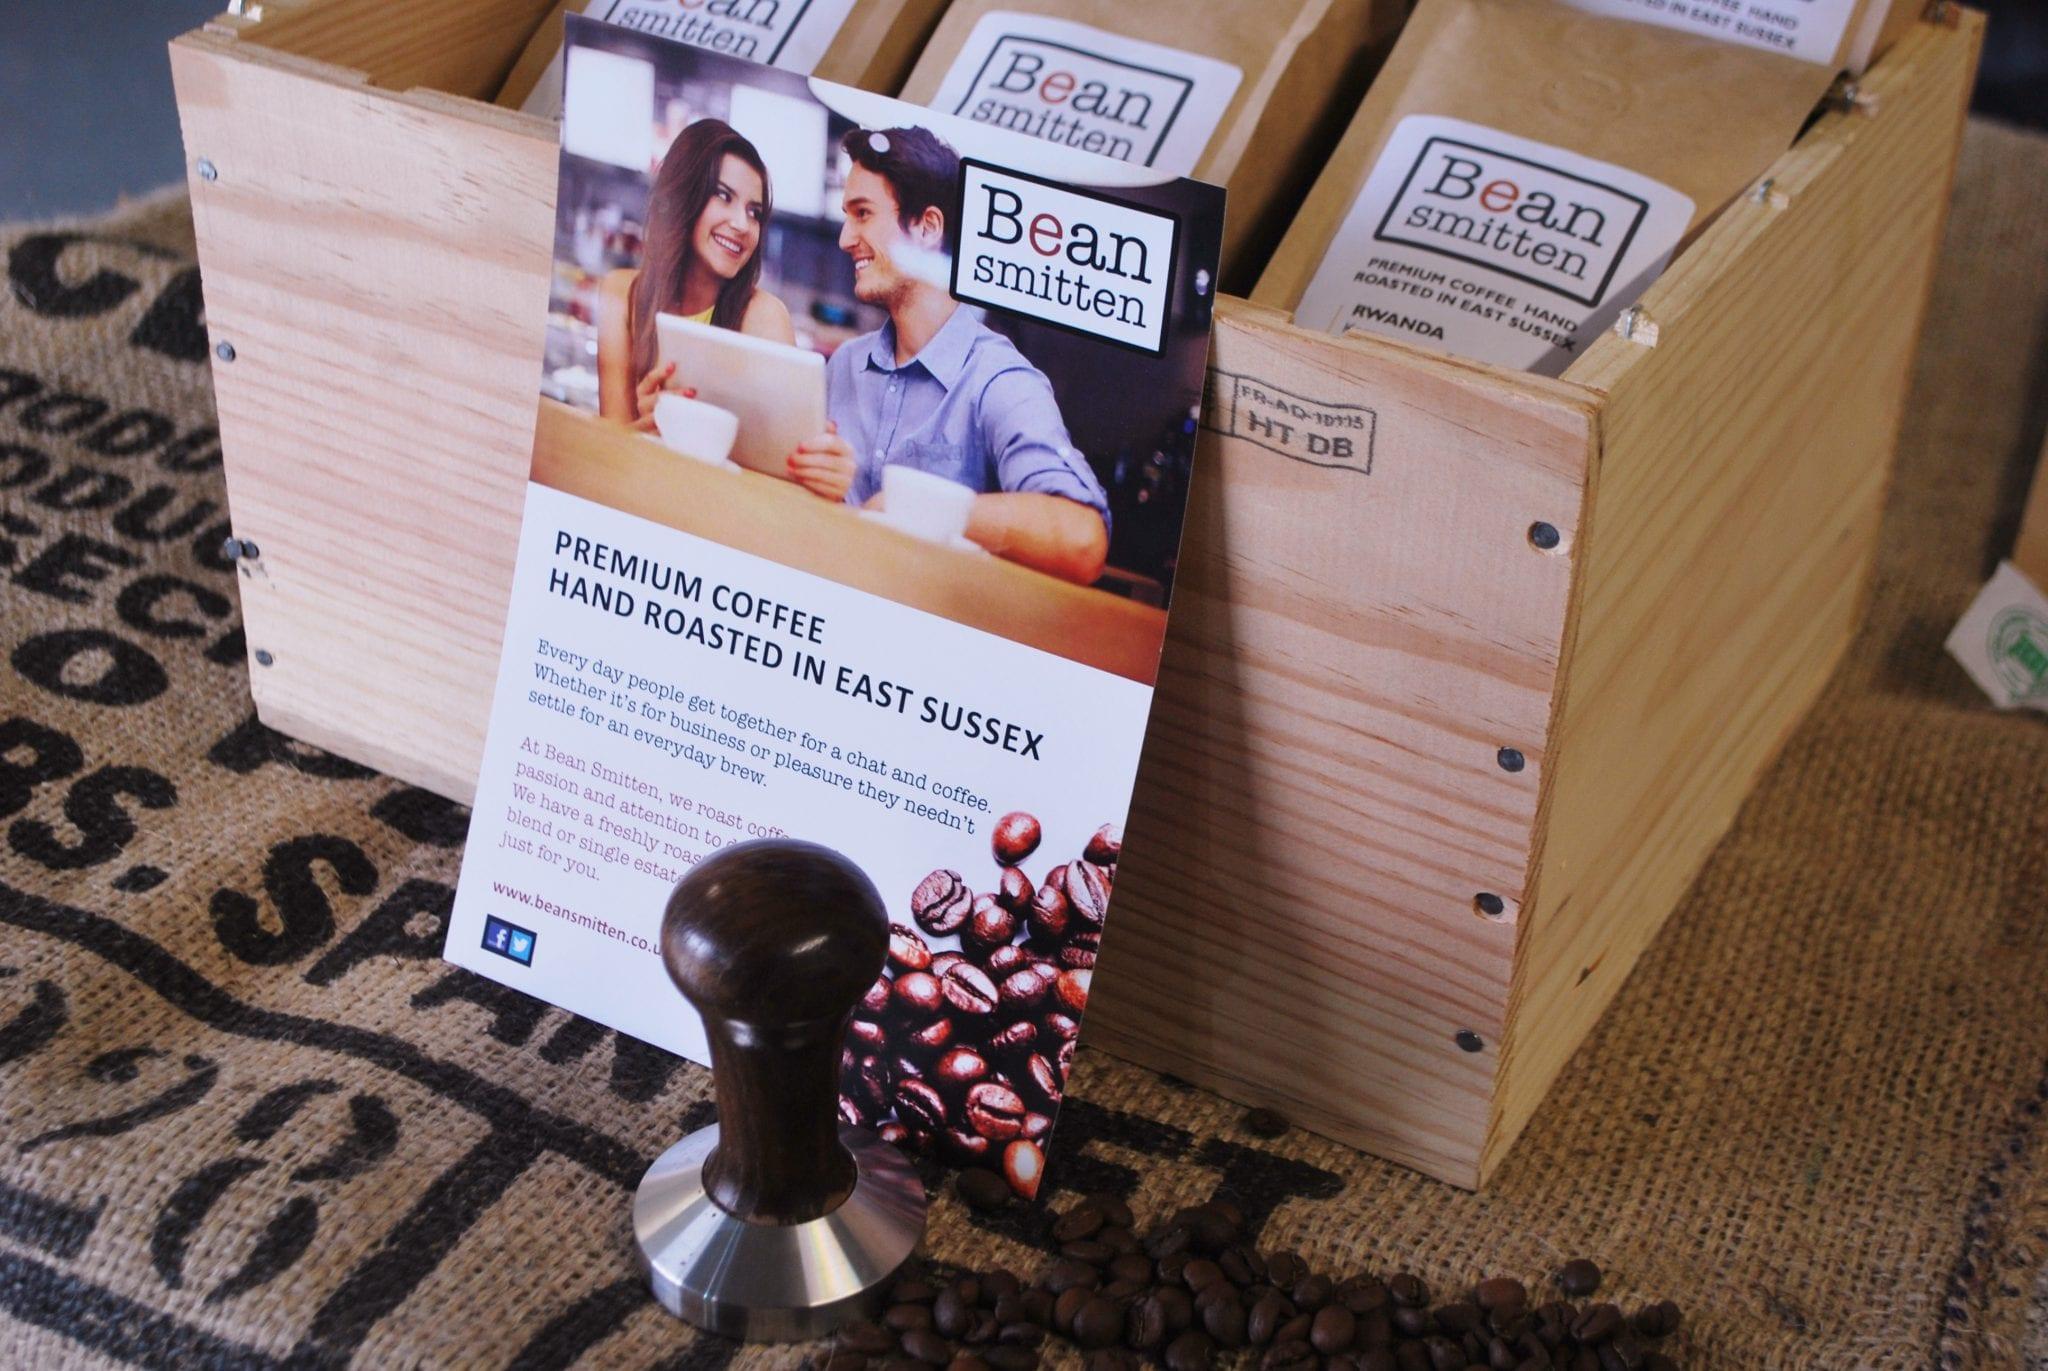 Coffee Roasting Business Plan